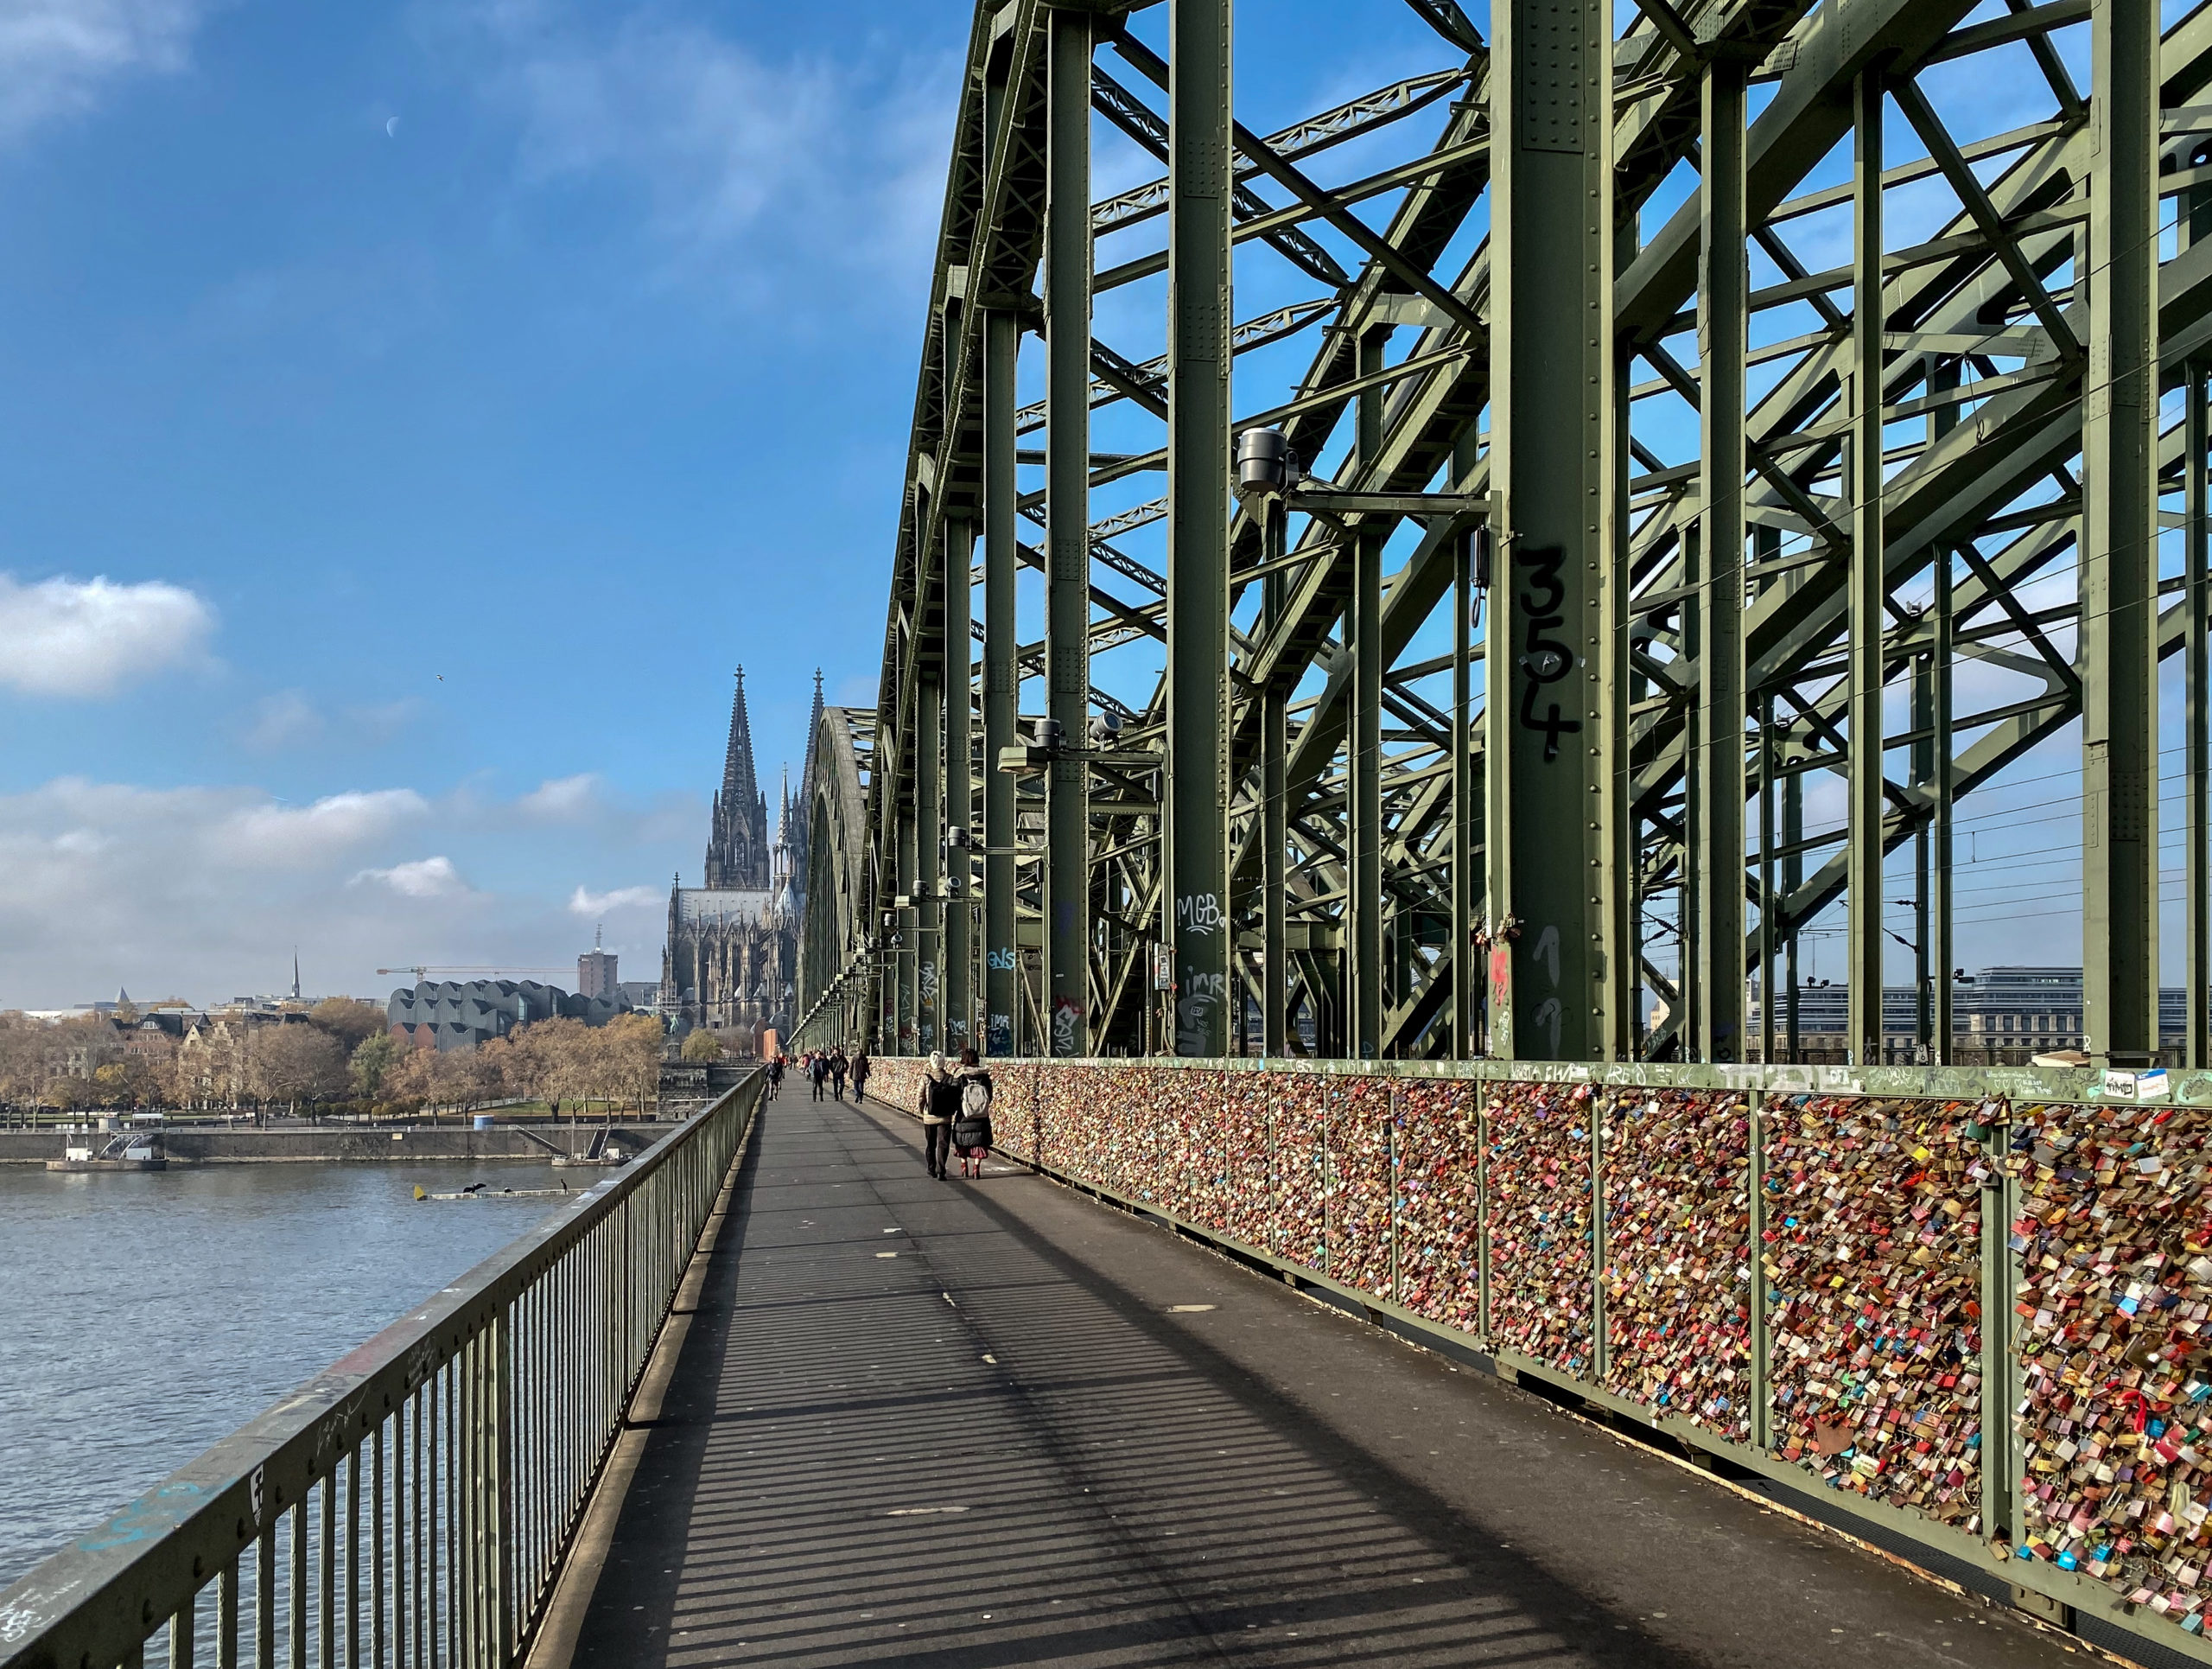 Schlösserromantik in Köln am Rhein